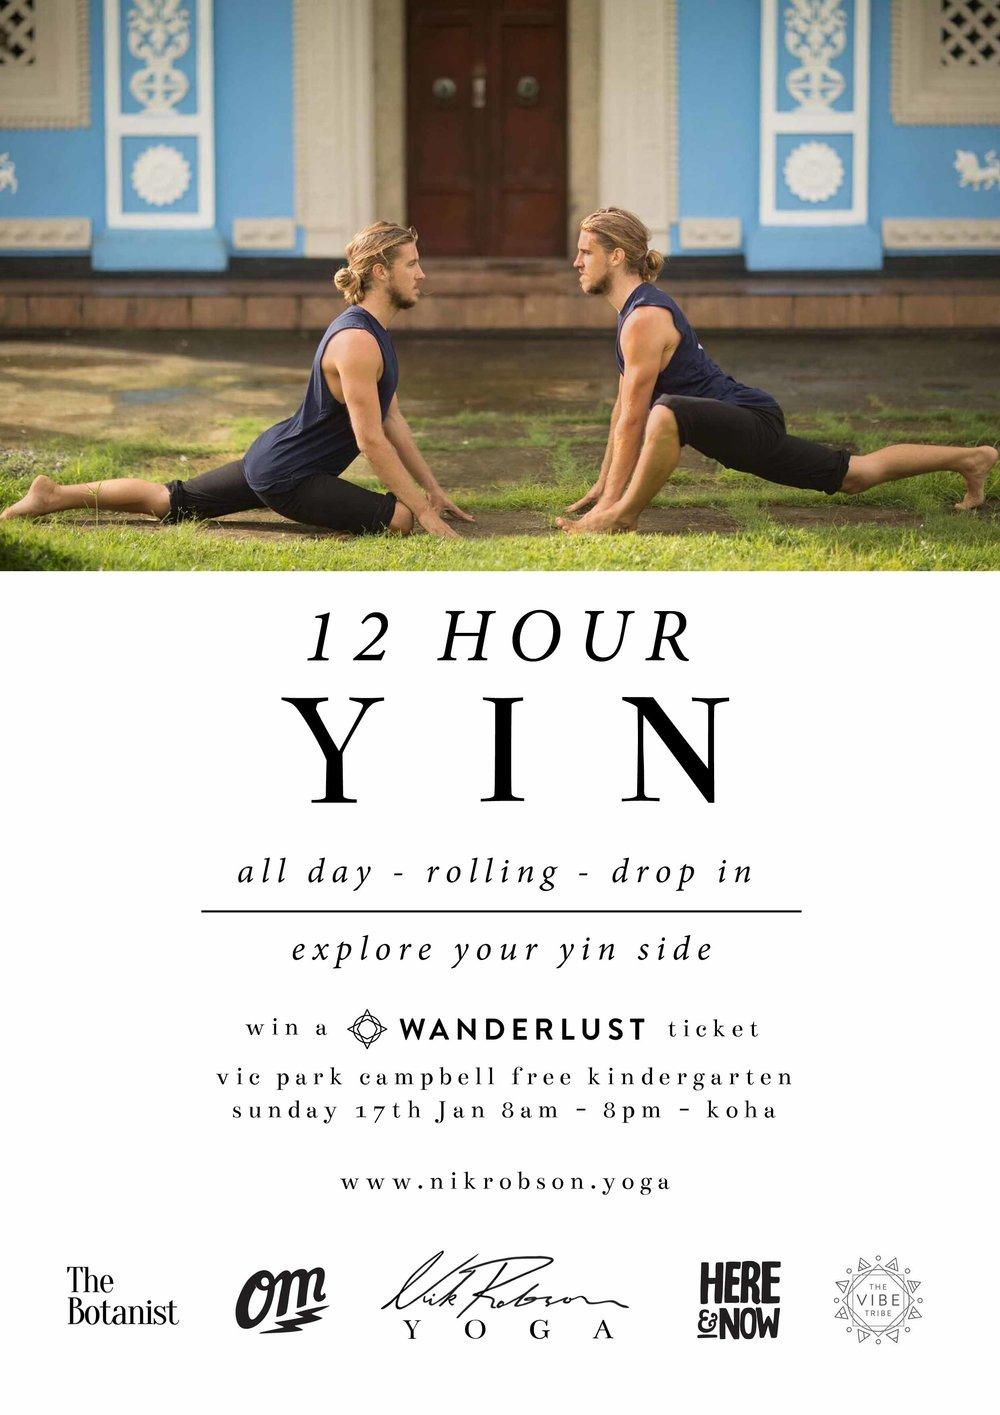 Nik Robson 12 Hour Yin Print Sponsors.jpg